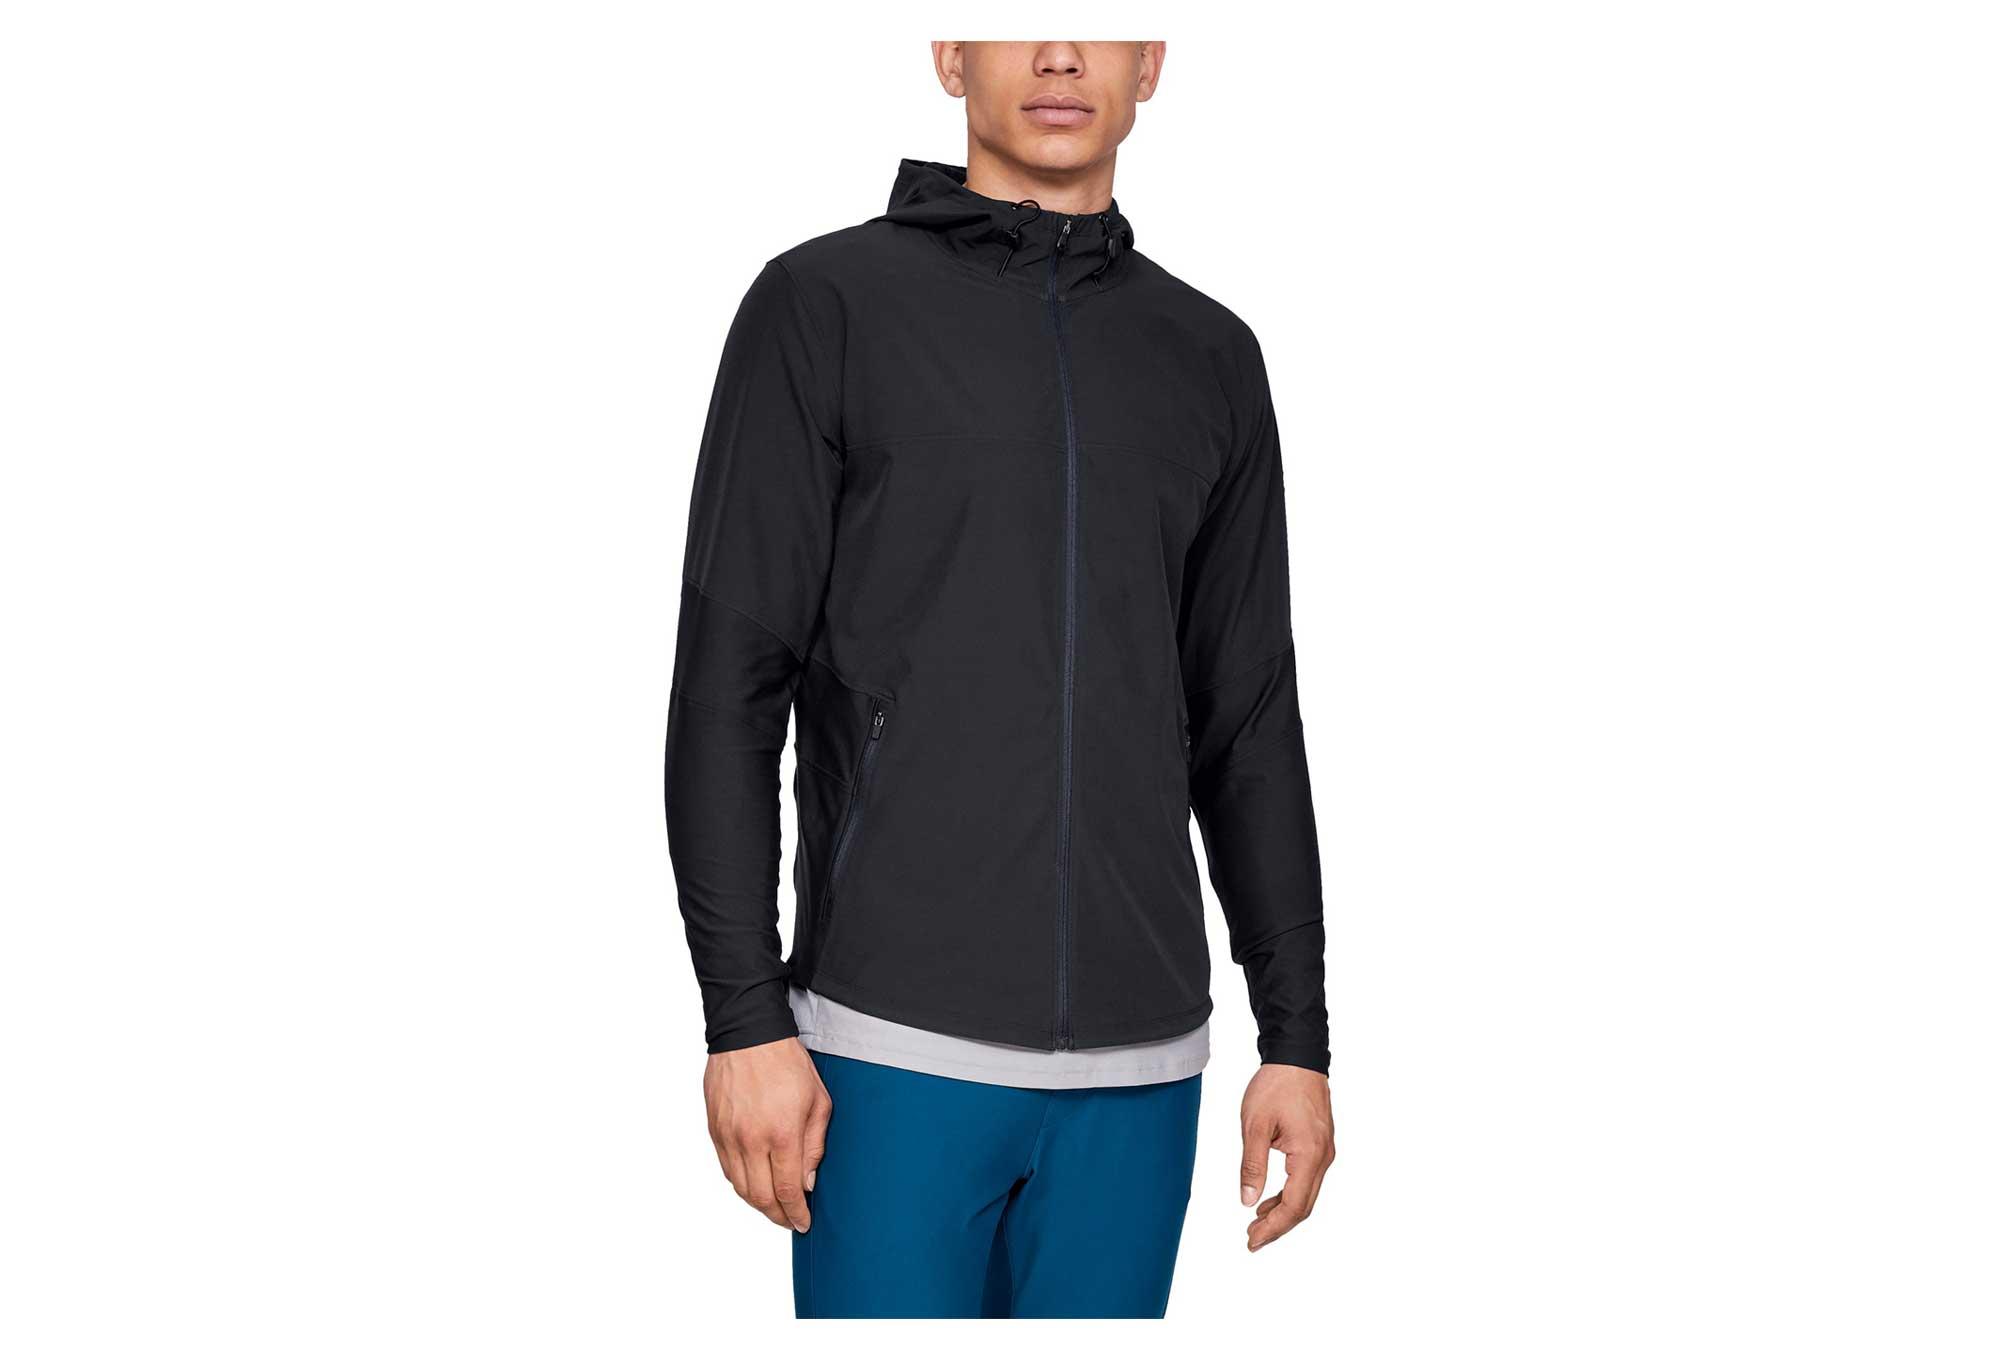 Under Armour Men/'s UA Microthread Vanish Jacket Large Black New